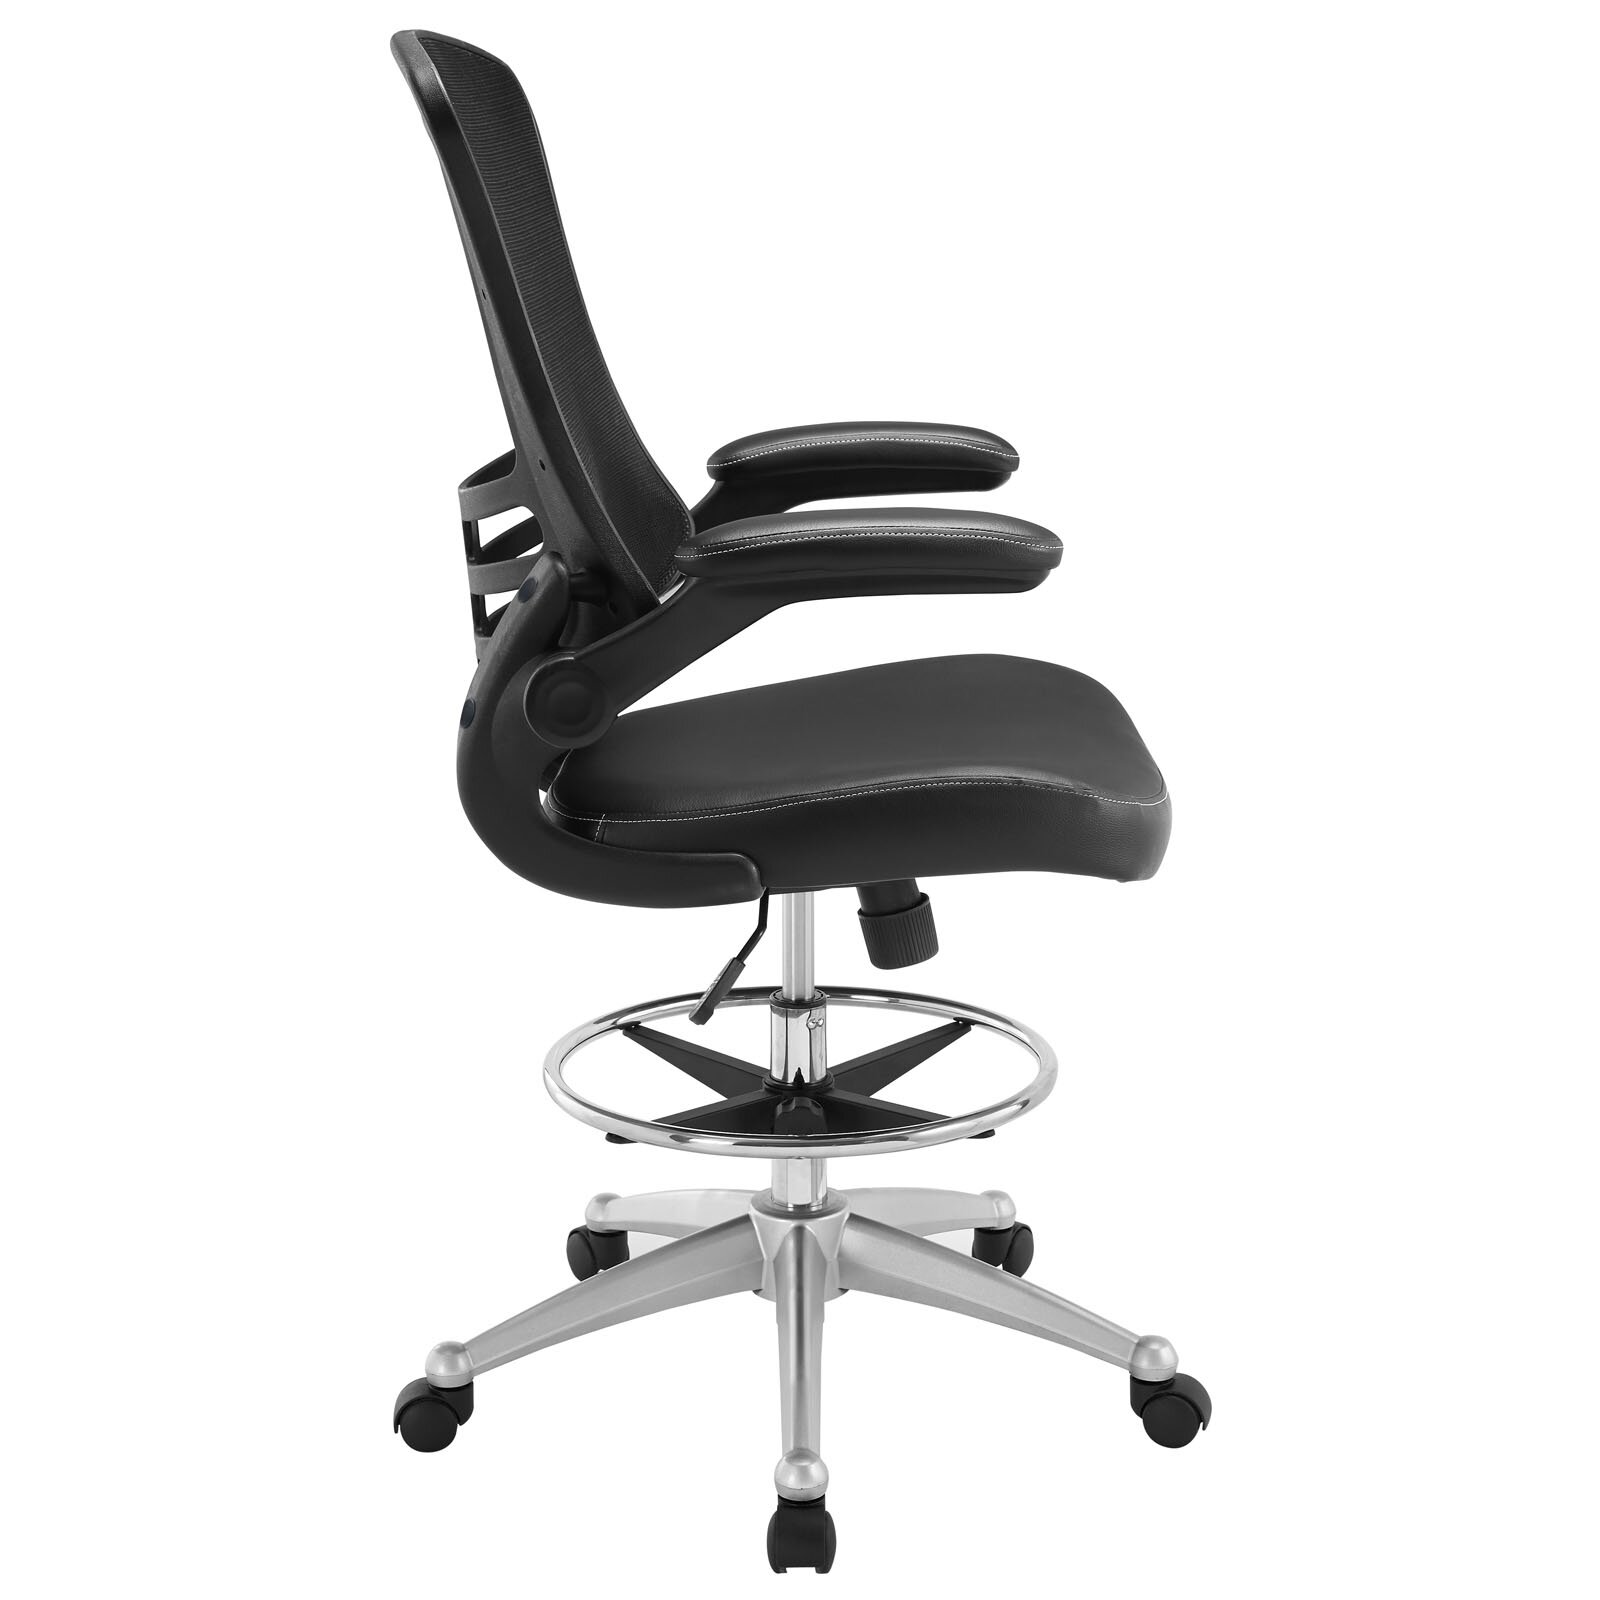 HighBack Mesh Drafting Chair Reviews – High Drafting Chair